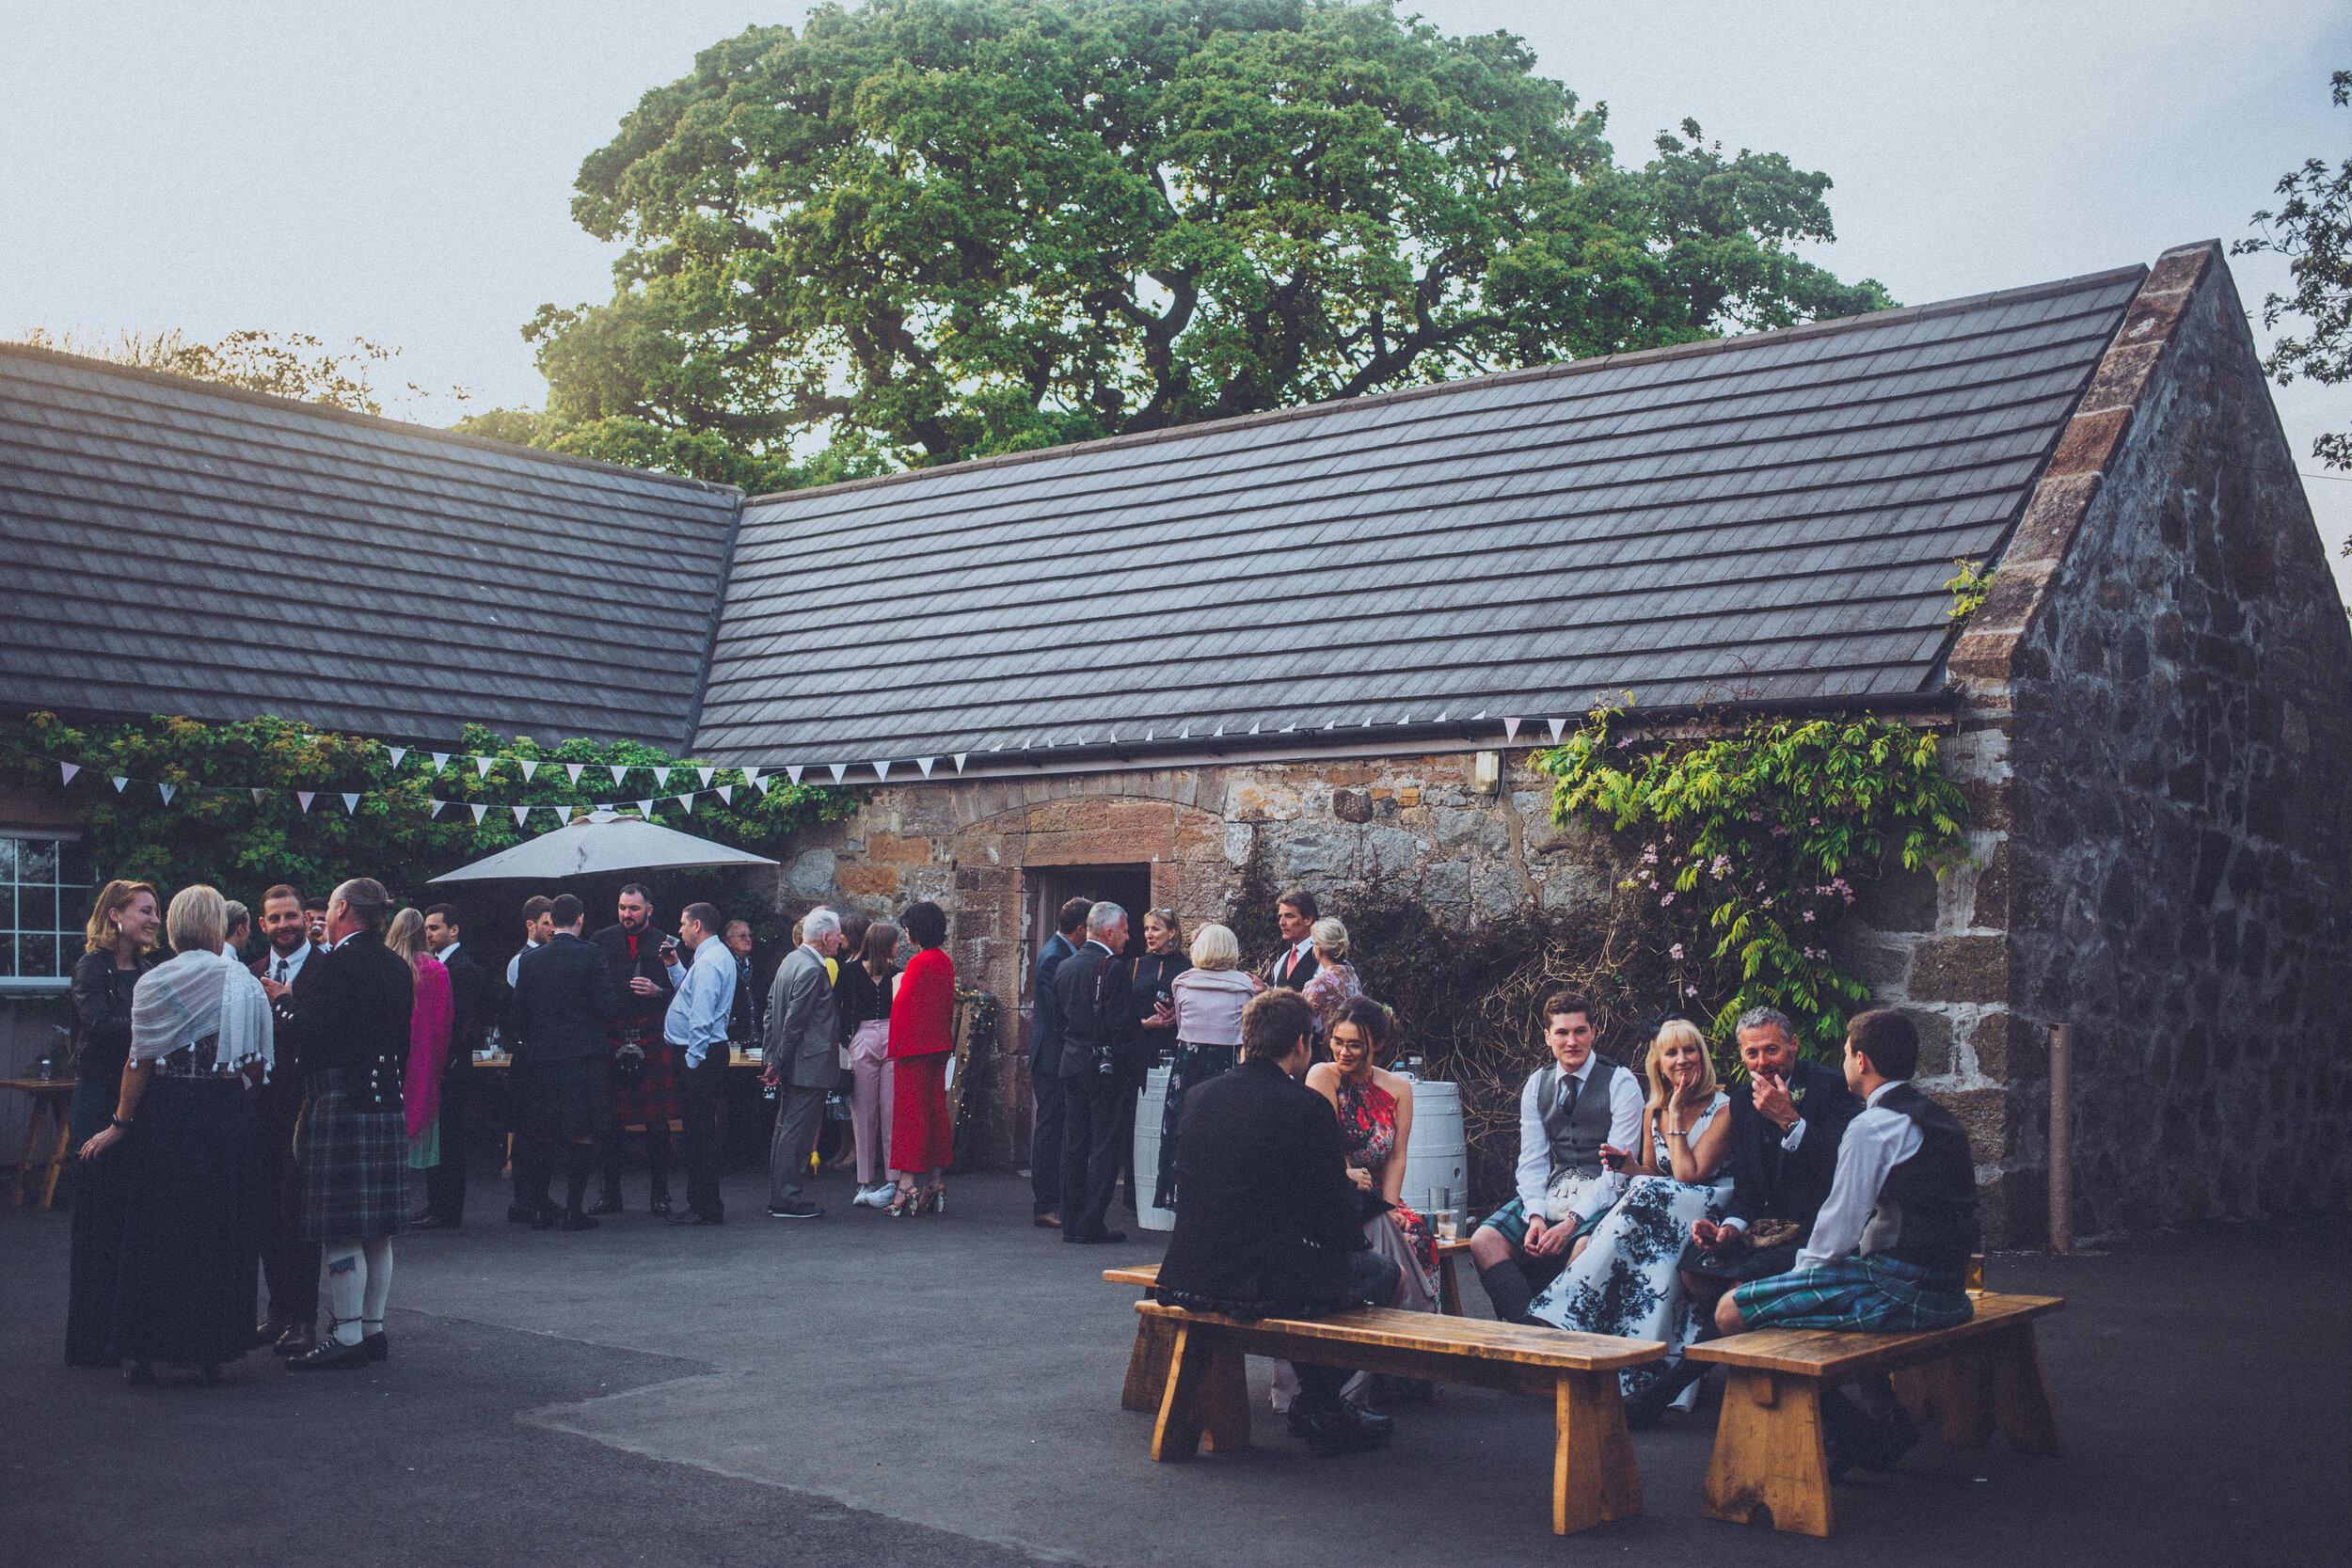 Dalduff Farm Ayrshire Wedding Photography - Claire Basiuk Photographer - 26.jpg